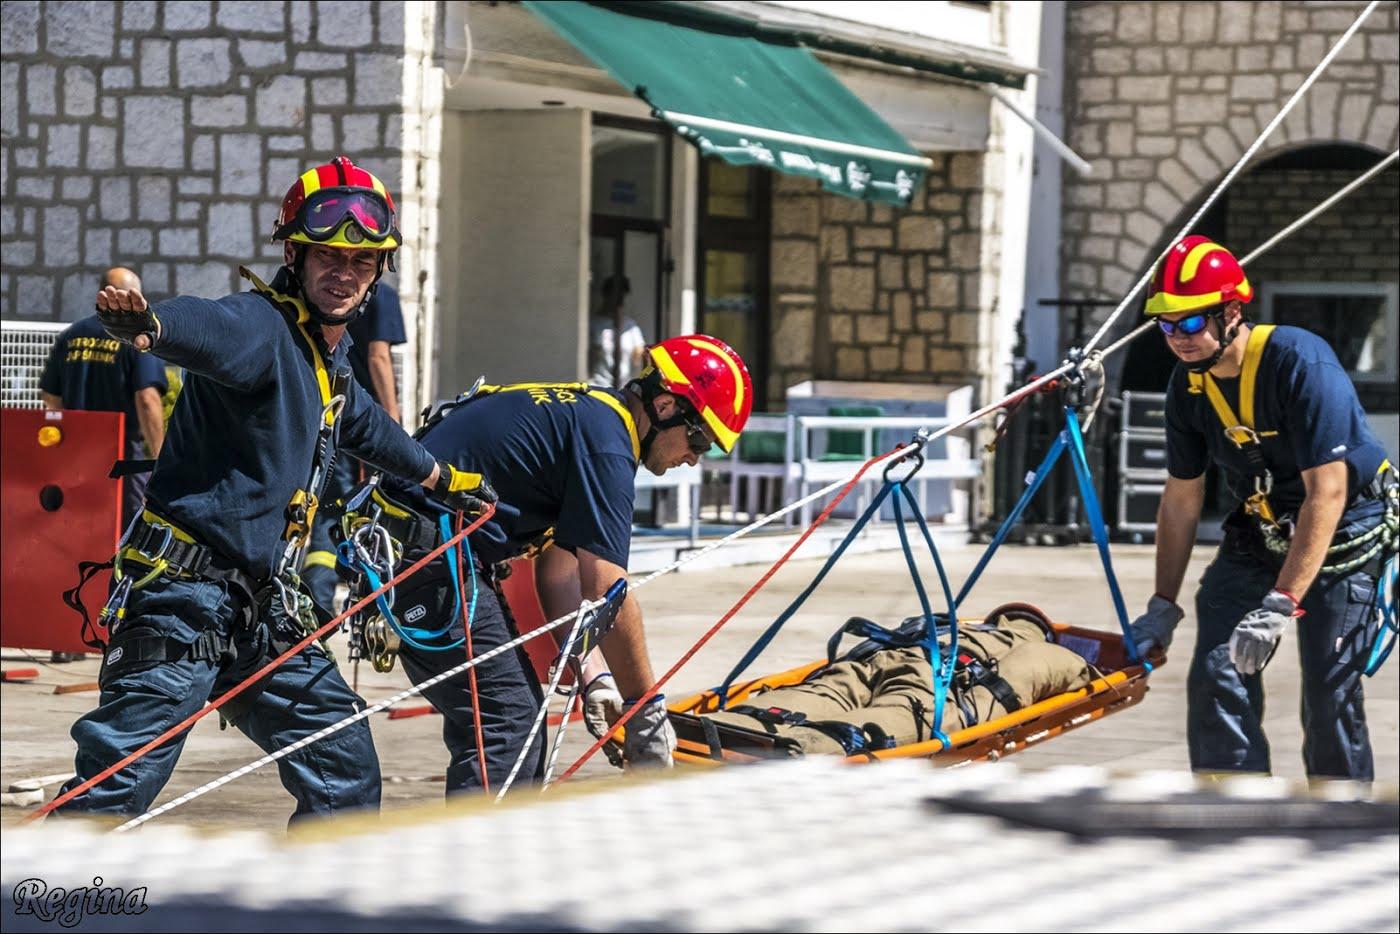 Javna vatrogasna postrojba grada Šibenika